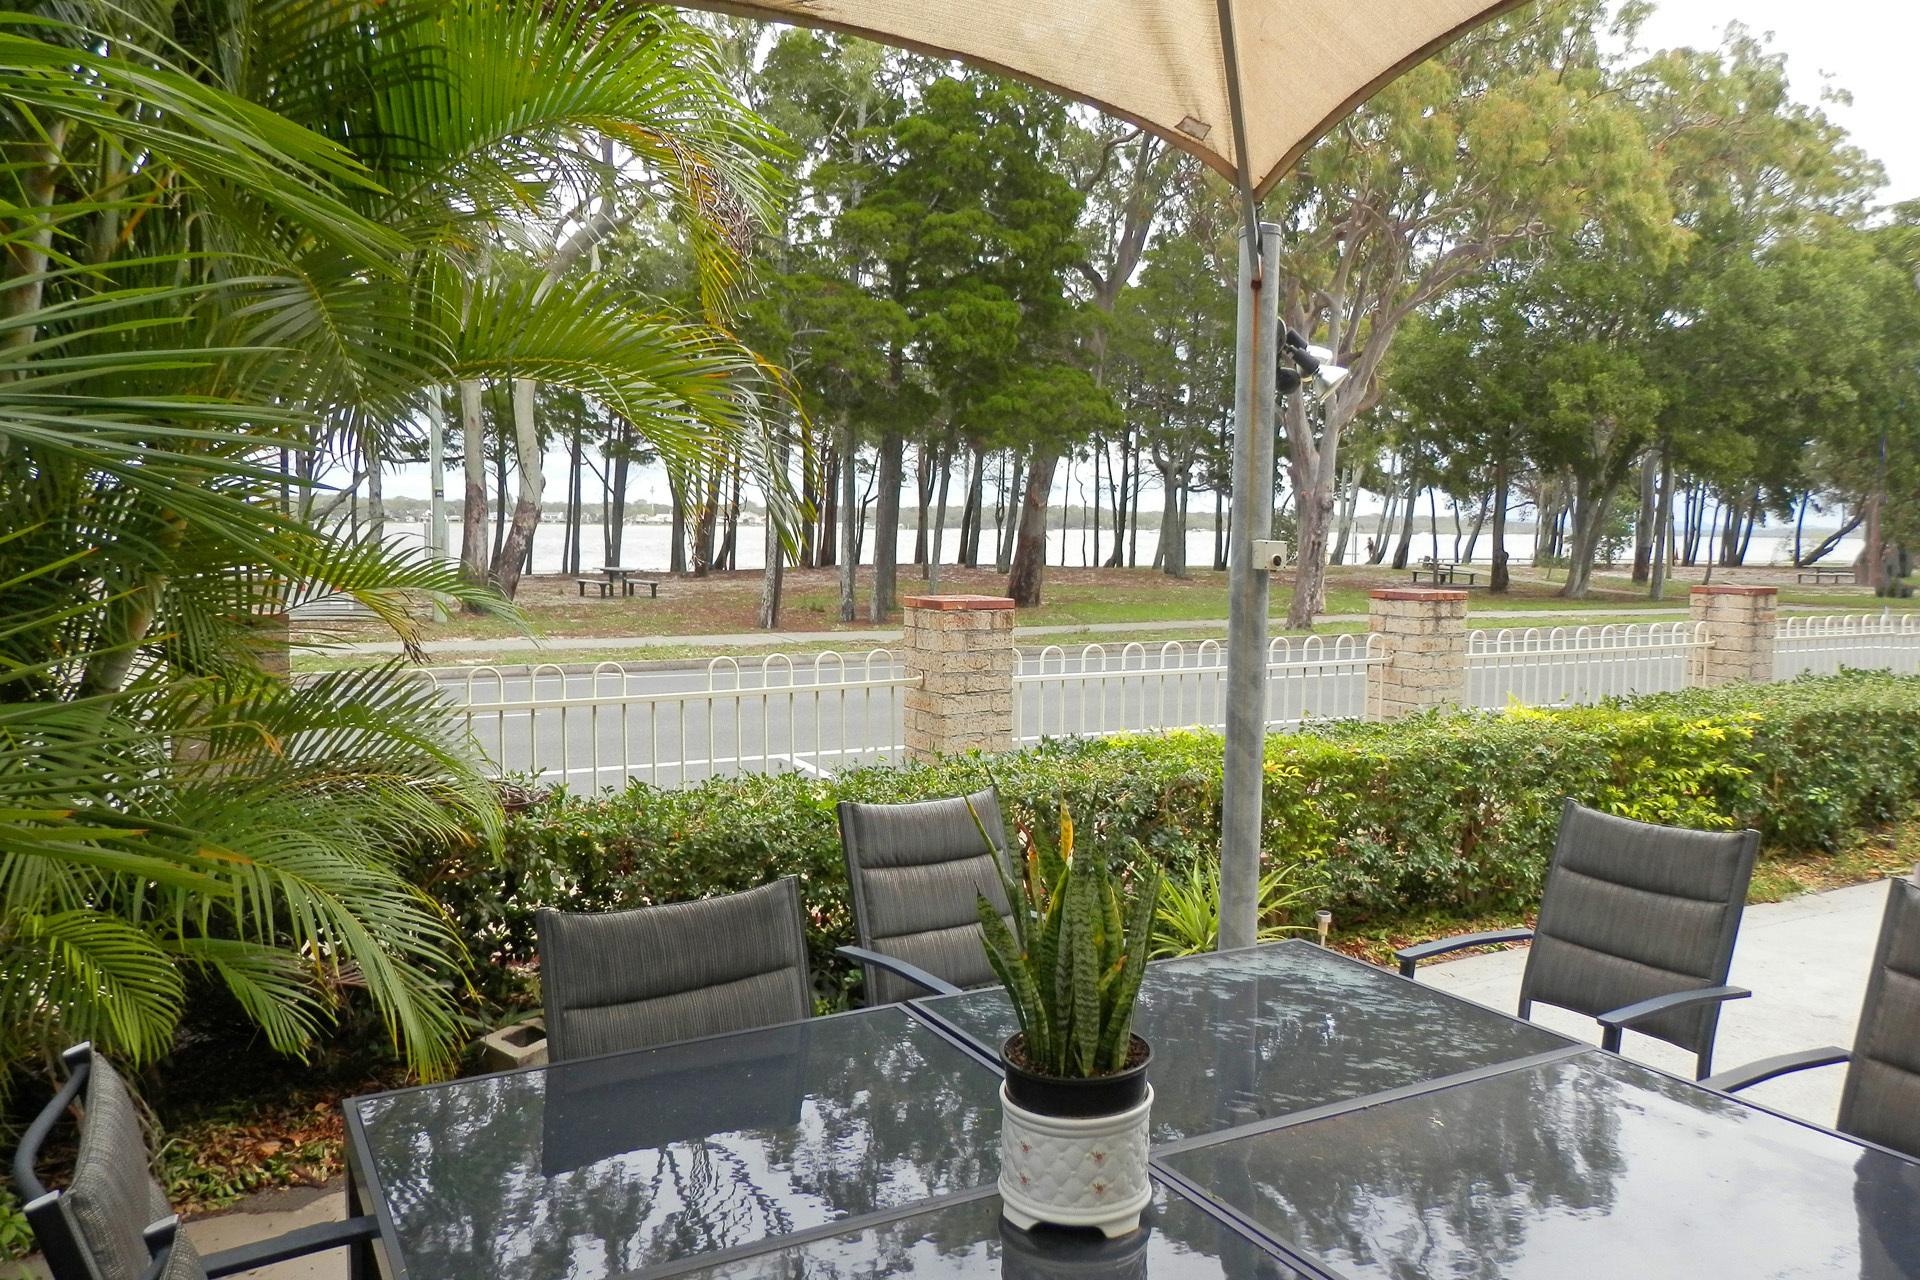 b - Sylvan Beach Resort